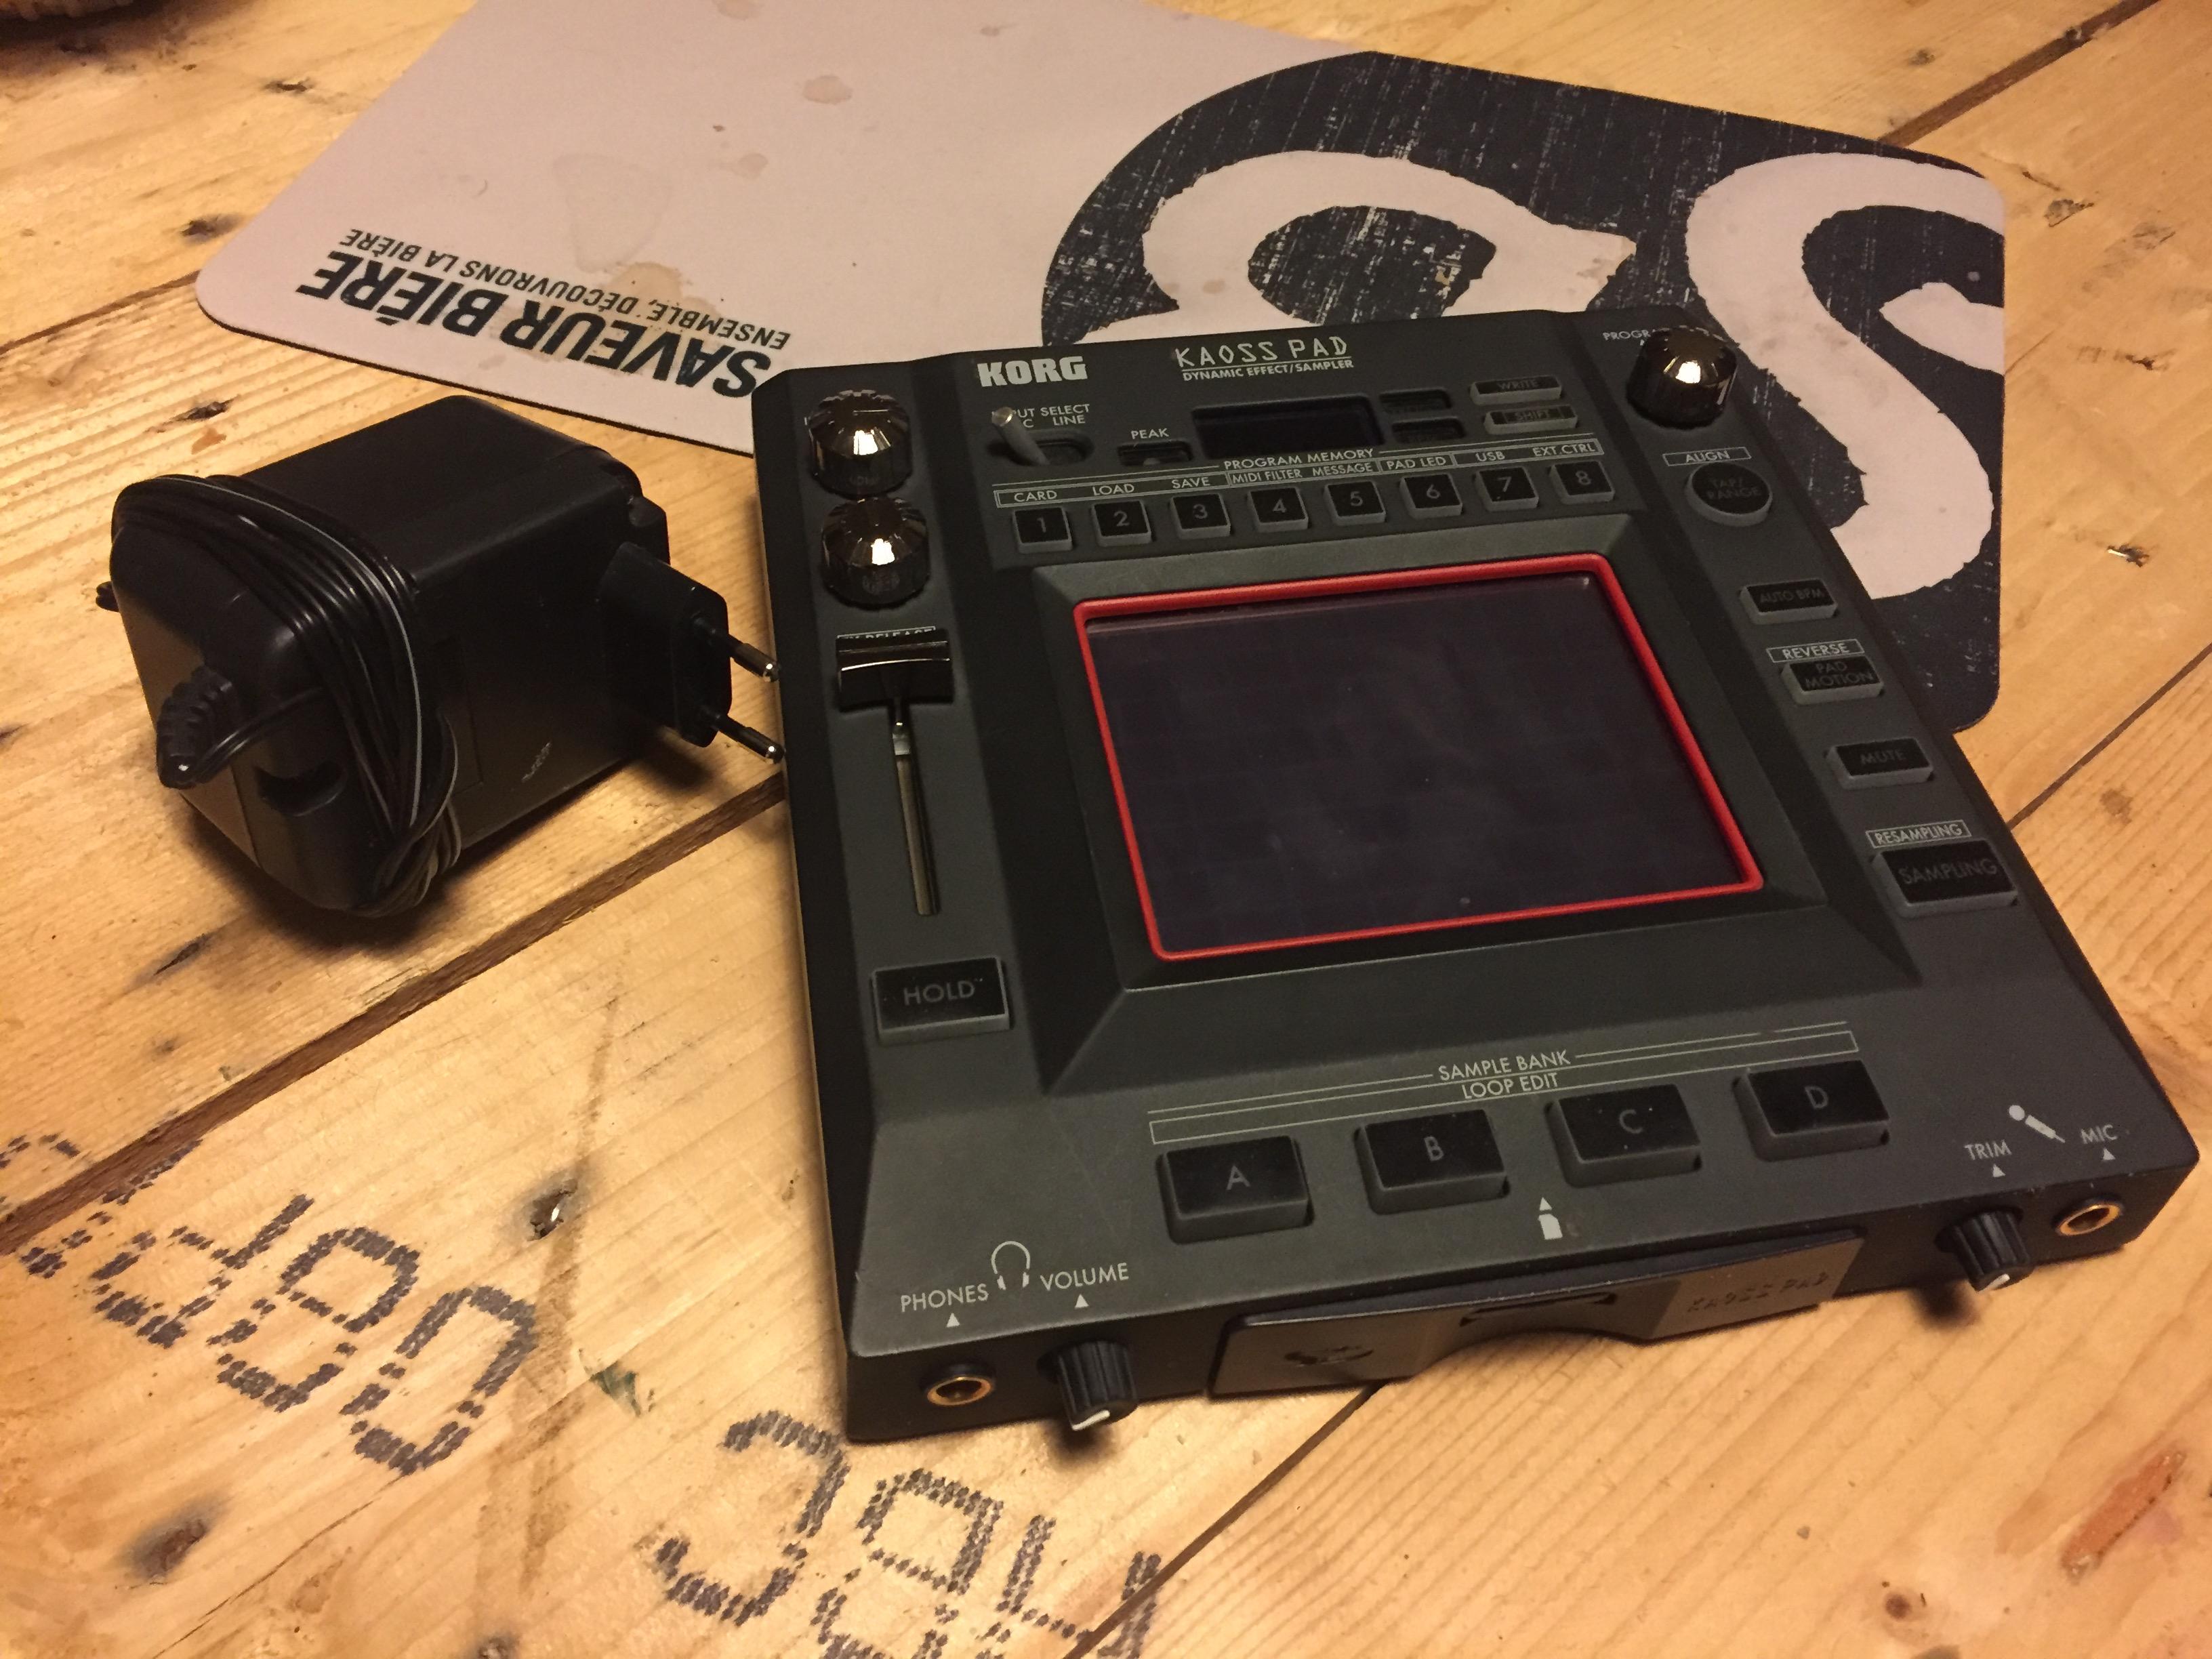 korg kaoss pad 3 kp3 image 1677115 audiofanzine. Black Bedroom Furniture Sets. Home Design Ideas